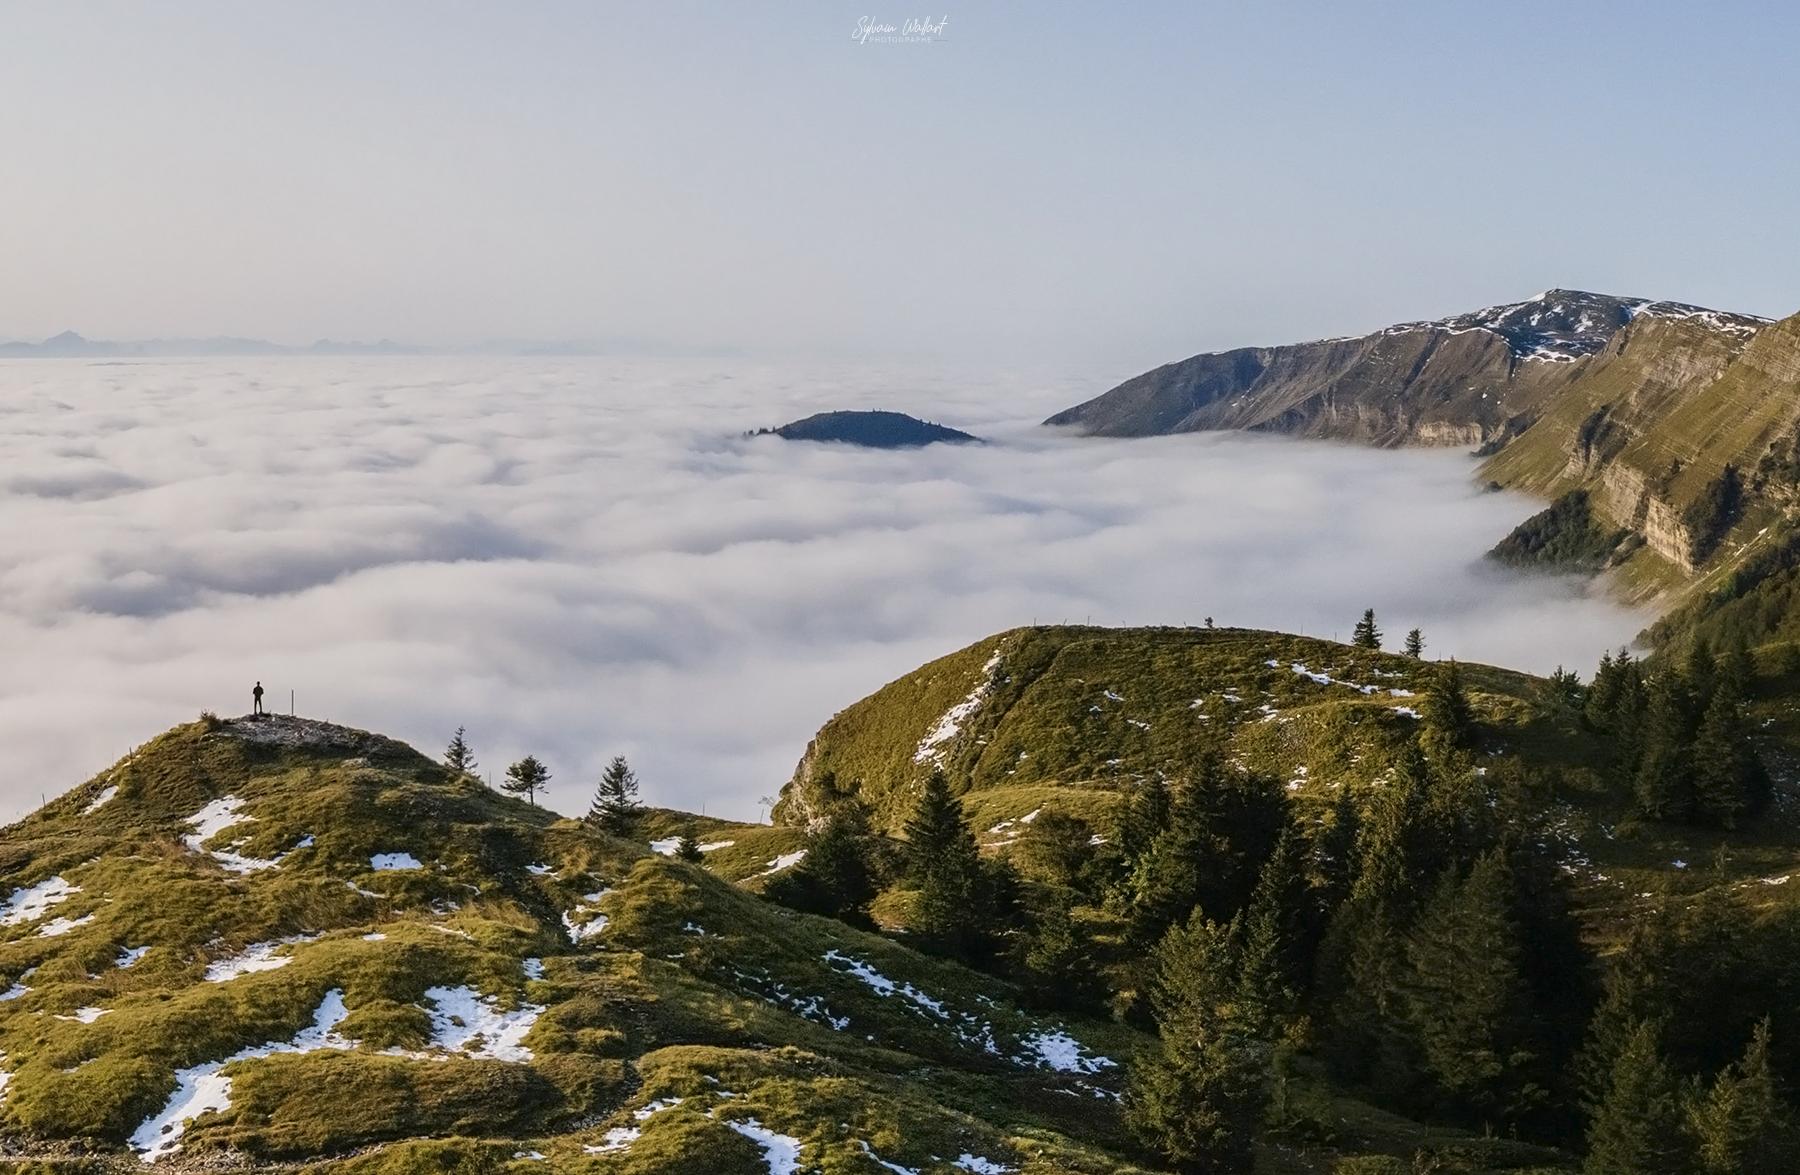 Le Jura, vidéo et photos du drone Pano_mer-de-nuage_2